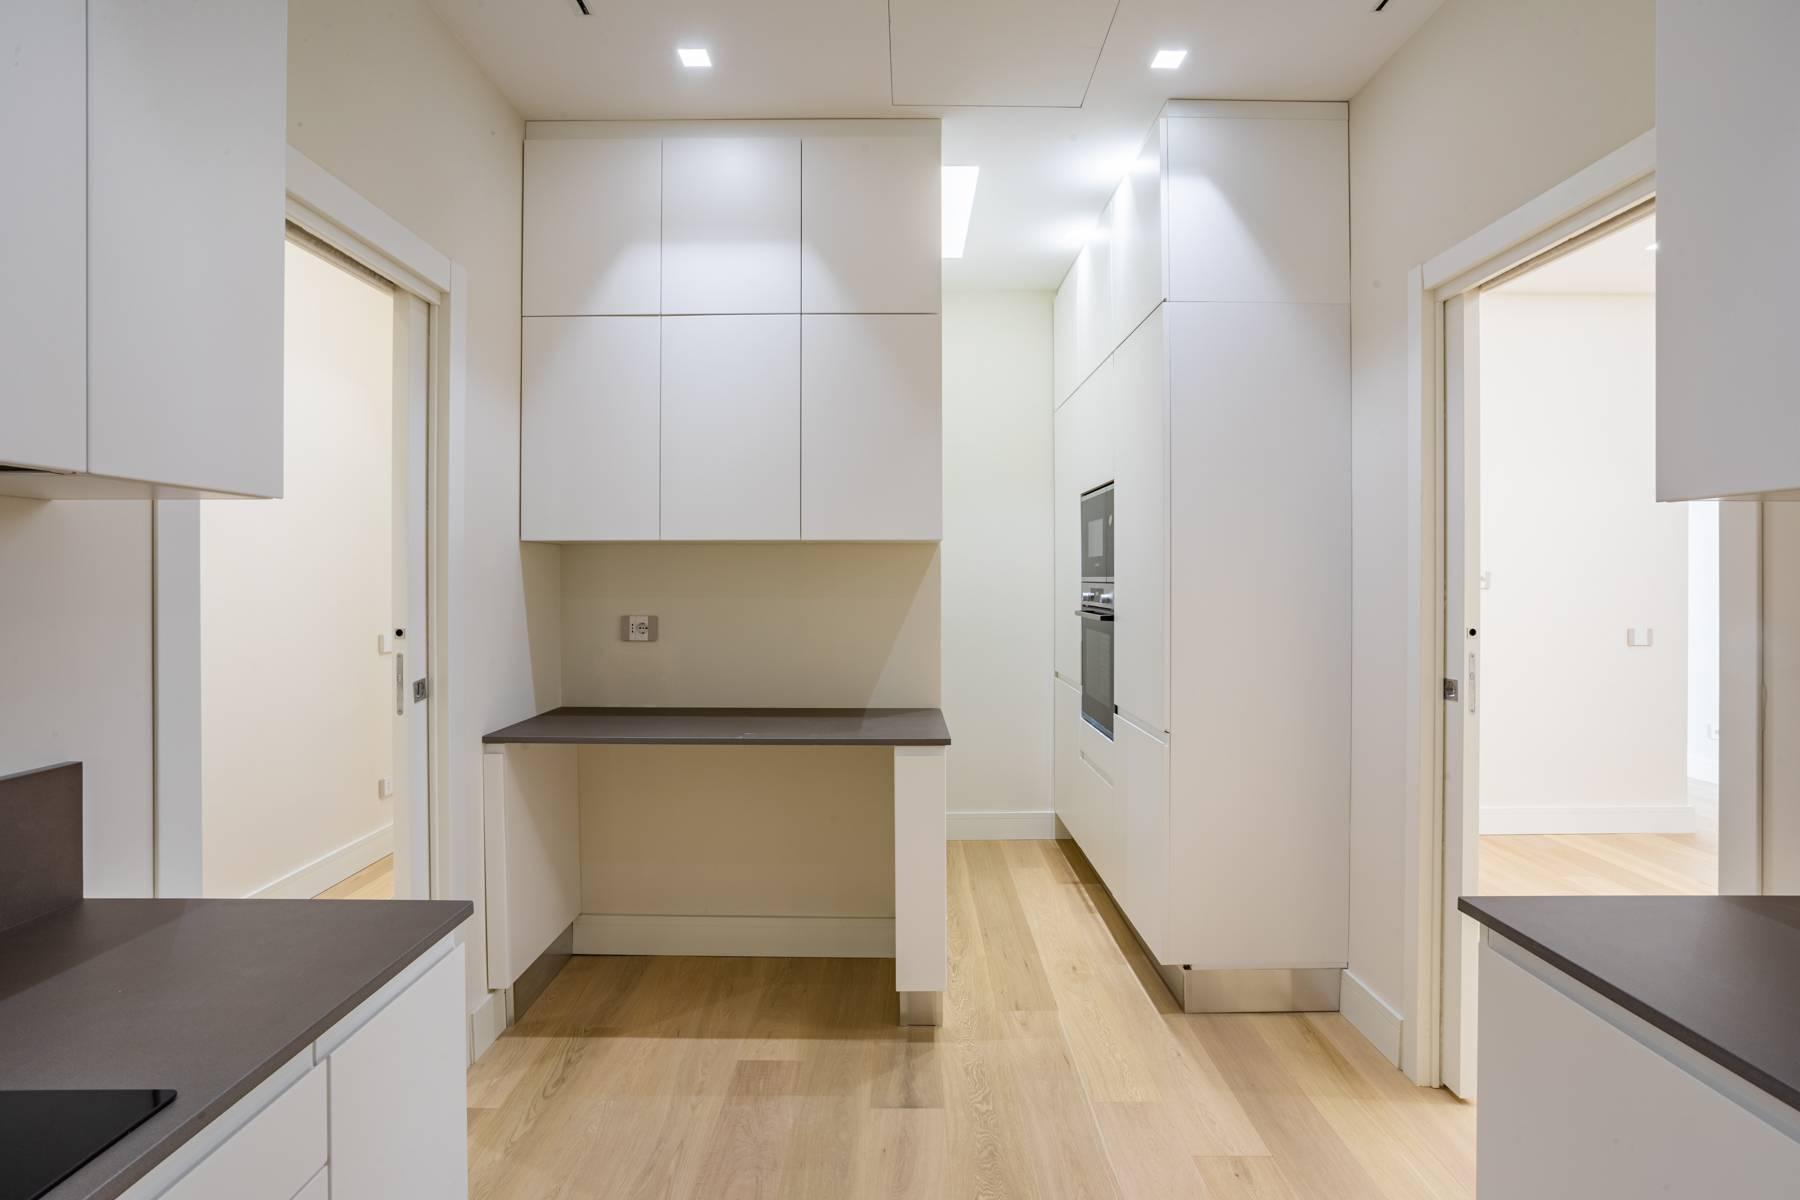 Spanish Steps luxury turnkey apartment - 7